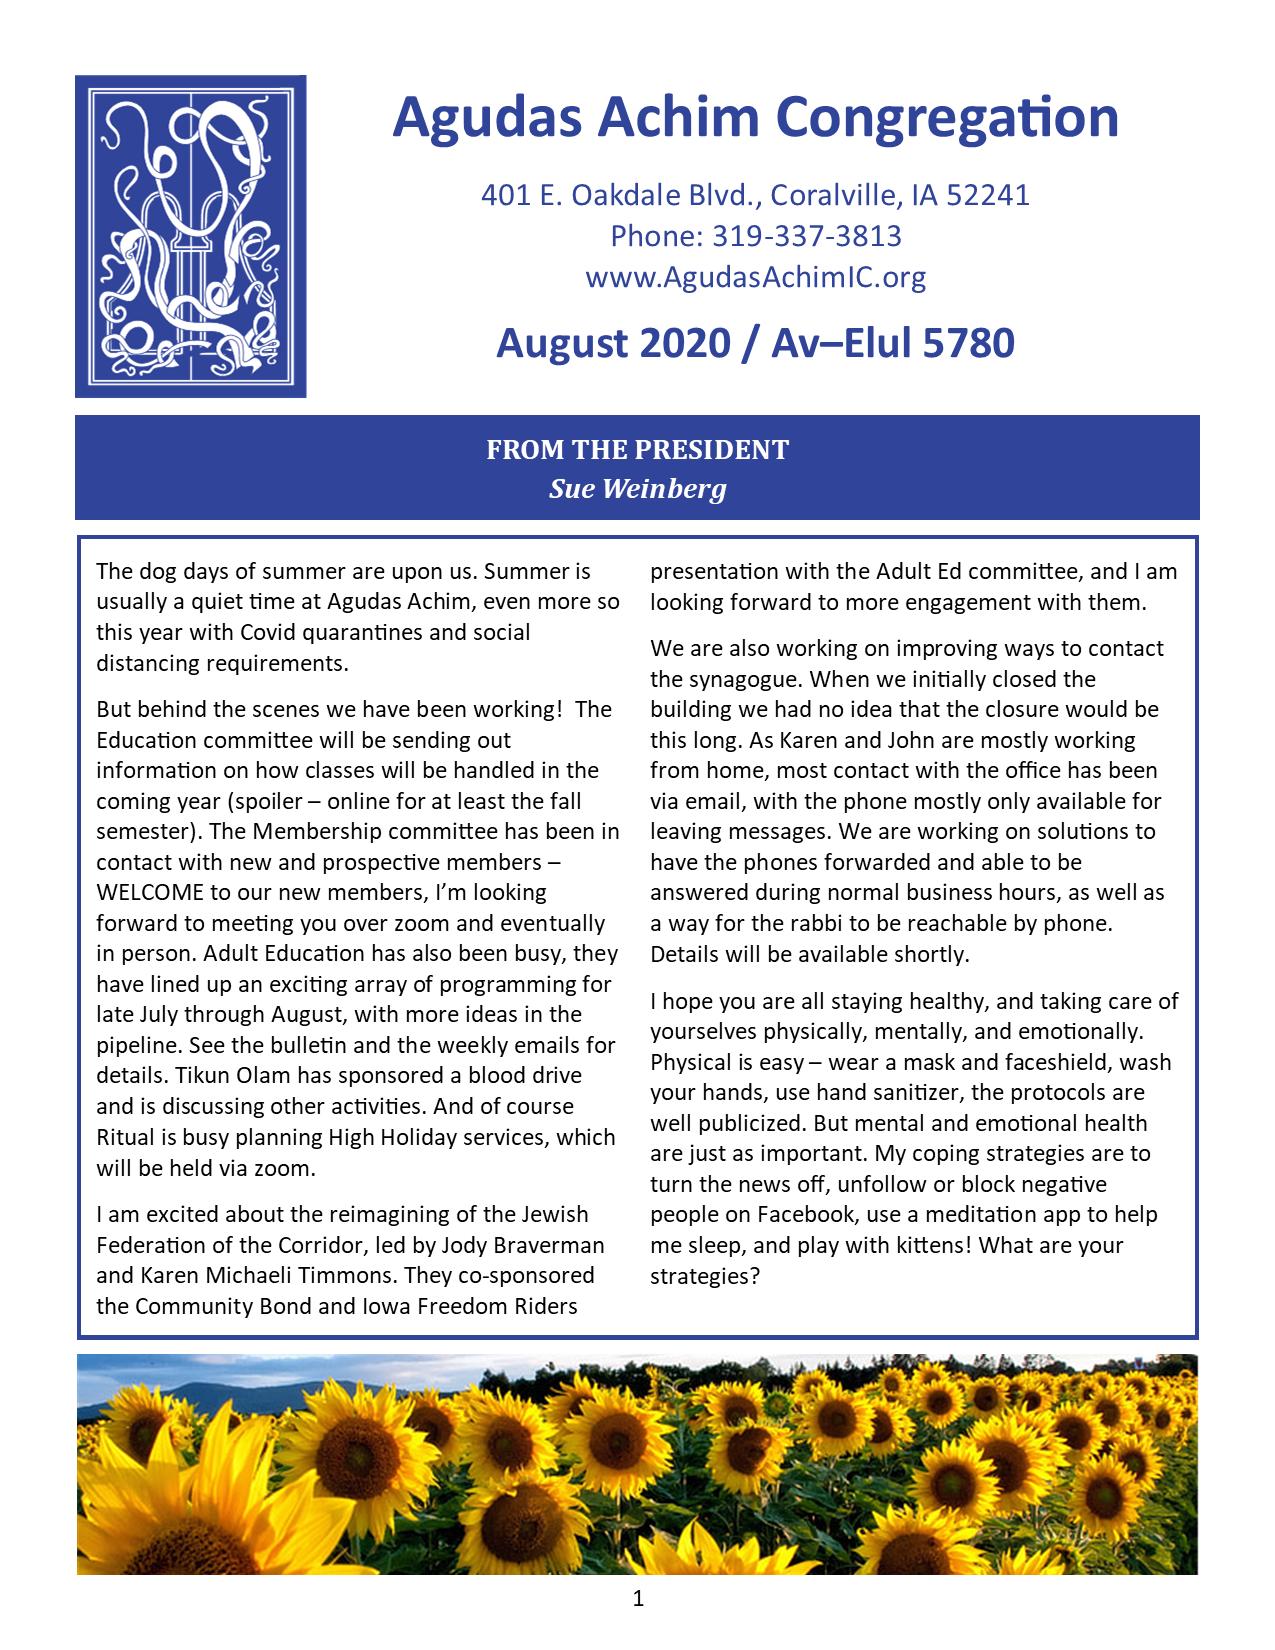 August 2020 Bulletin Cover